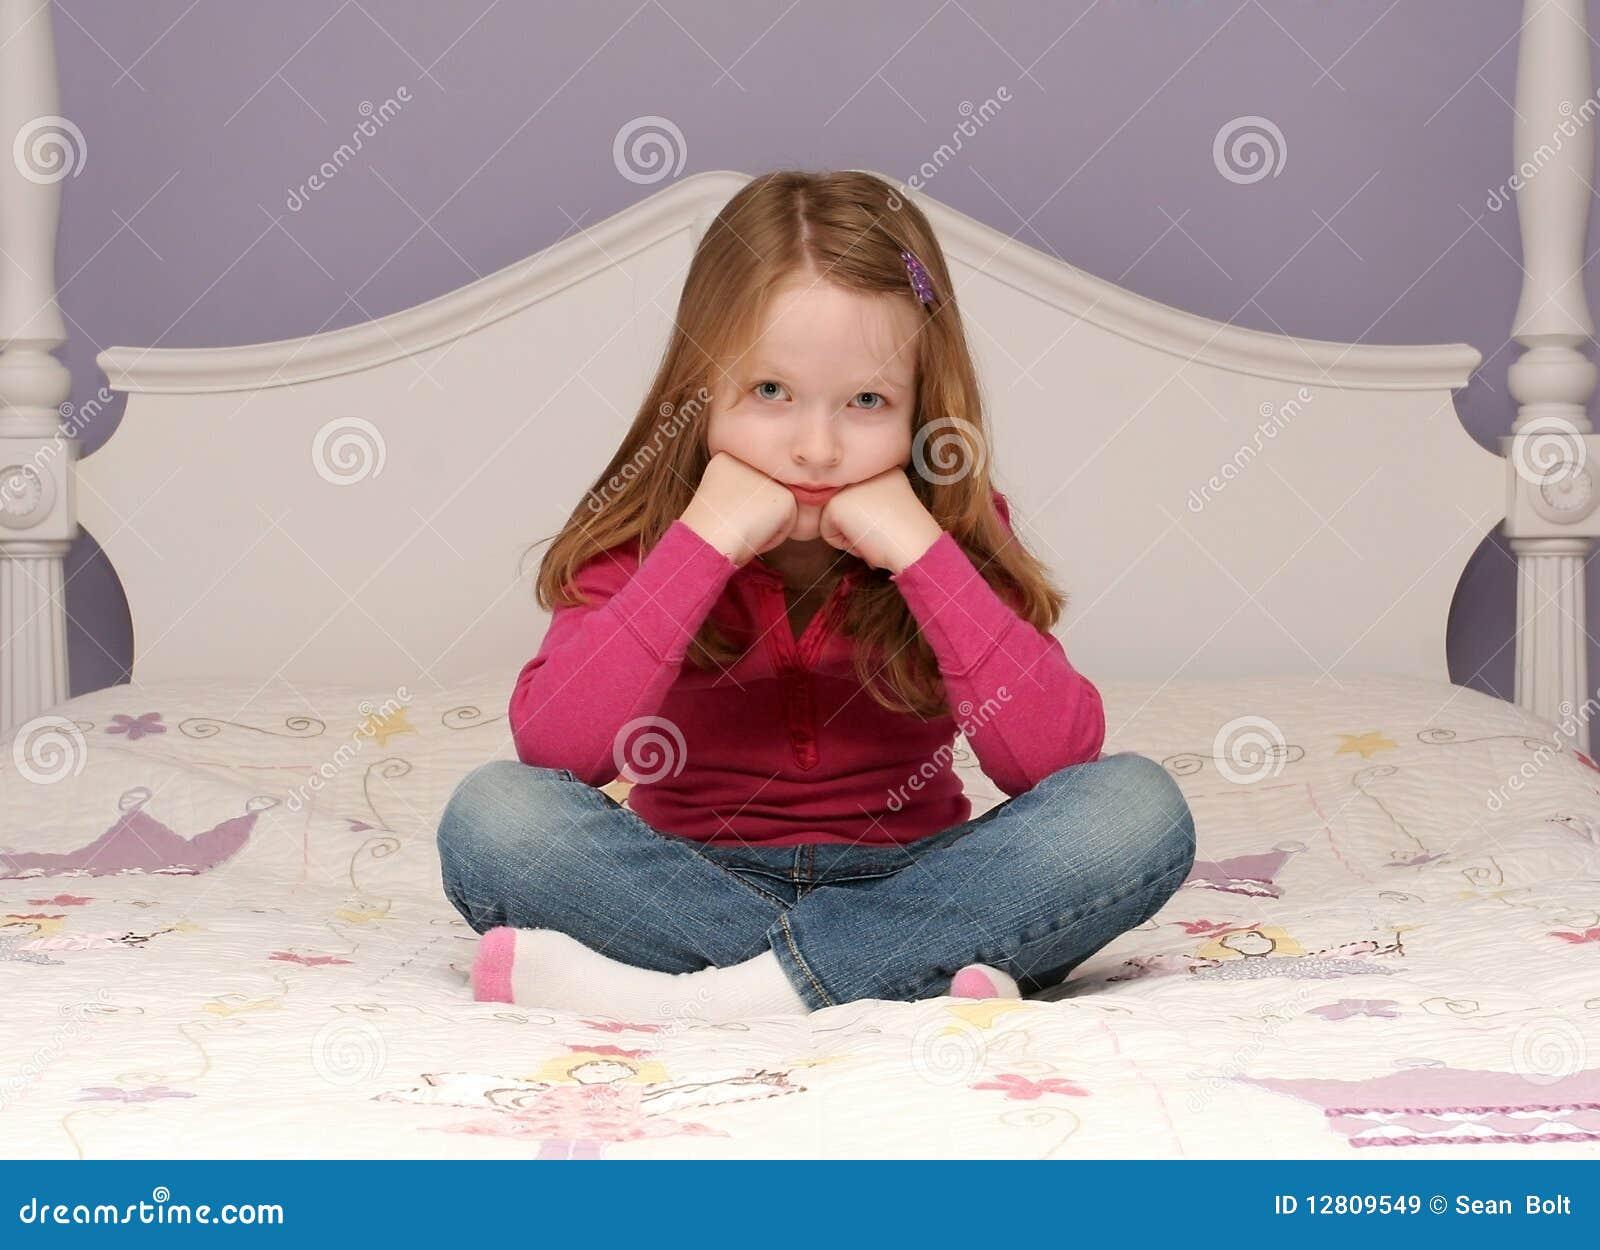 Rapariga que senta-se na cama